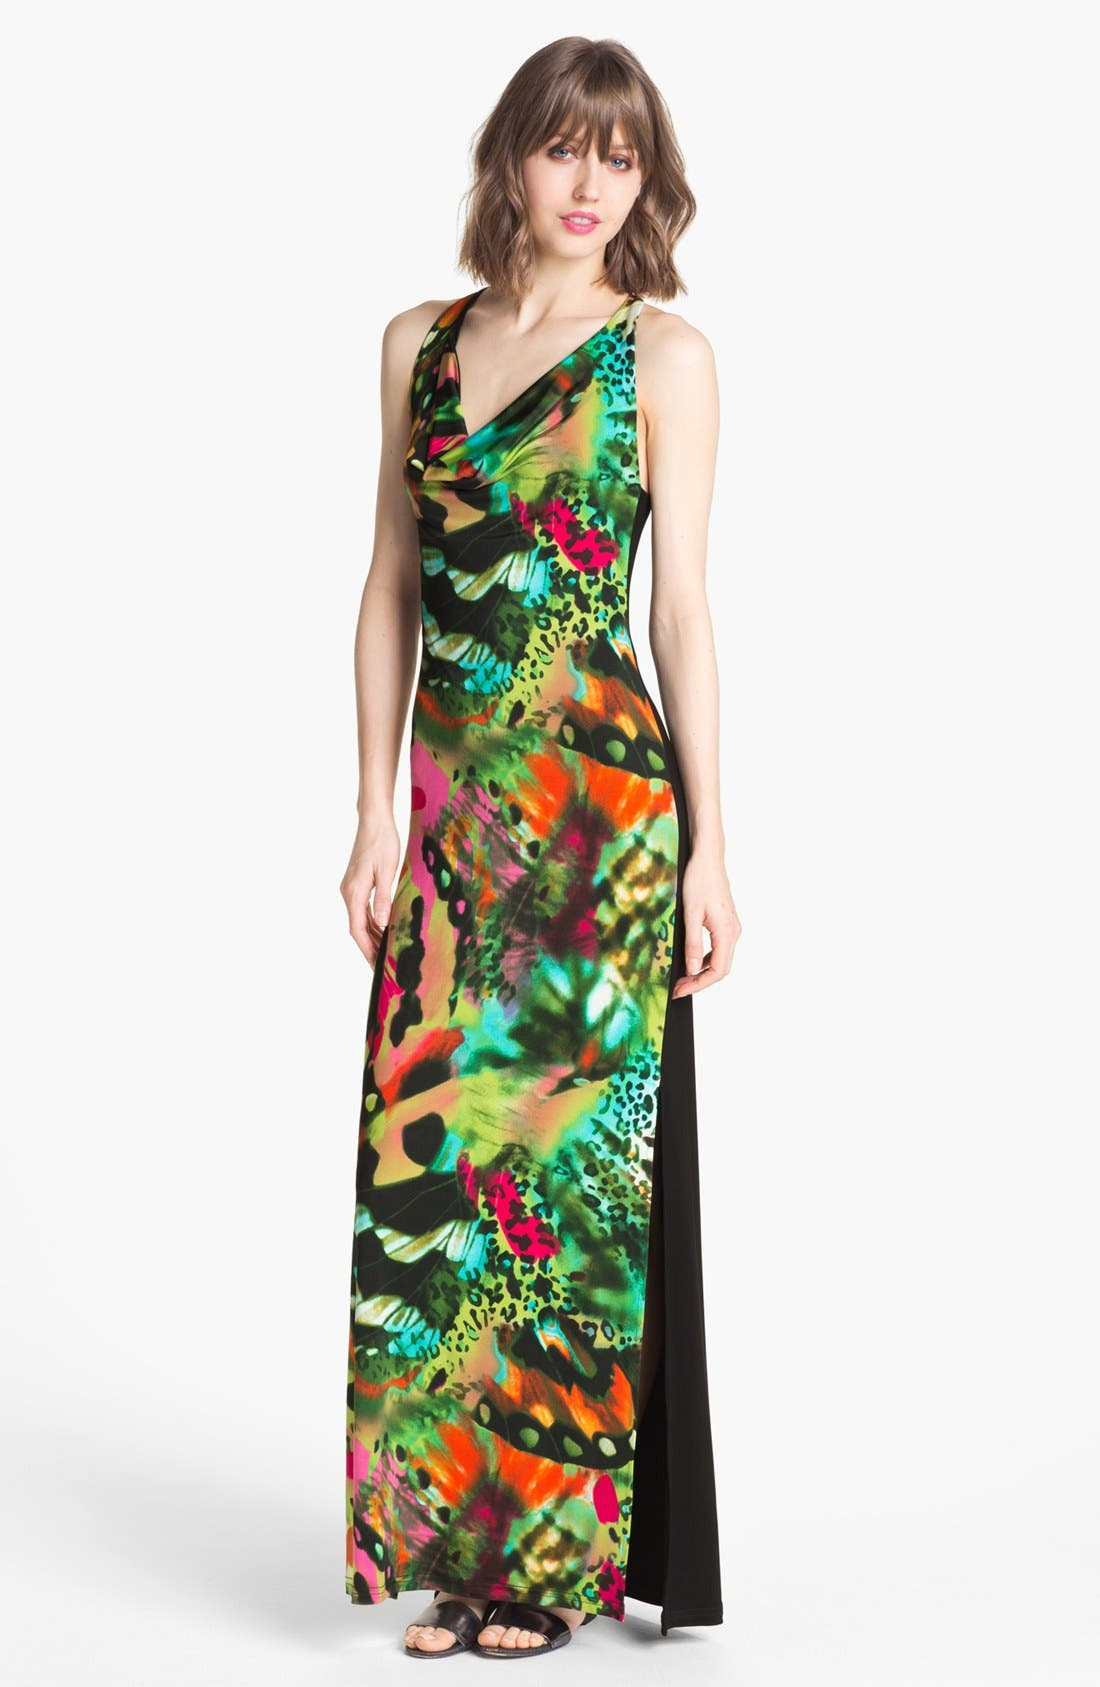 Main Image - Abi Ferrin 'Eve' Print Jersey Maxi Dress